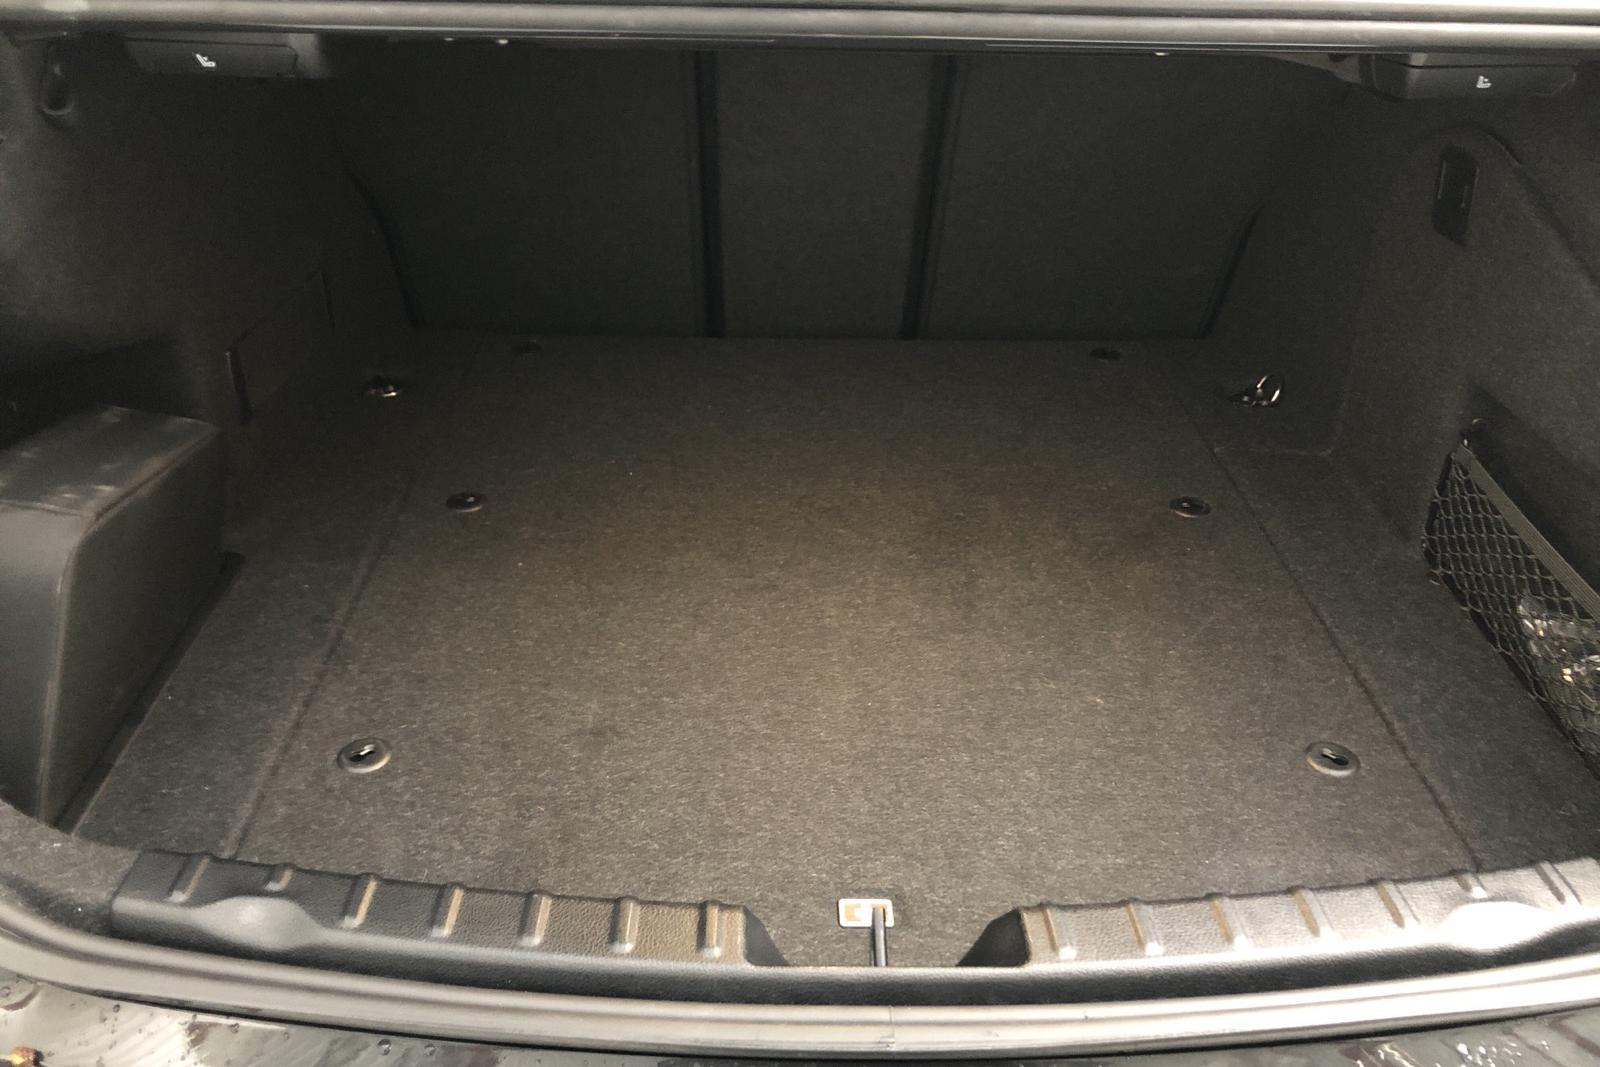 BMW 330e Sedan, F30 (252hk) - 41 306 km - Automatic - black - 2017